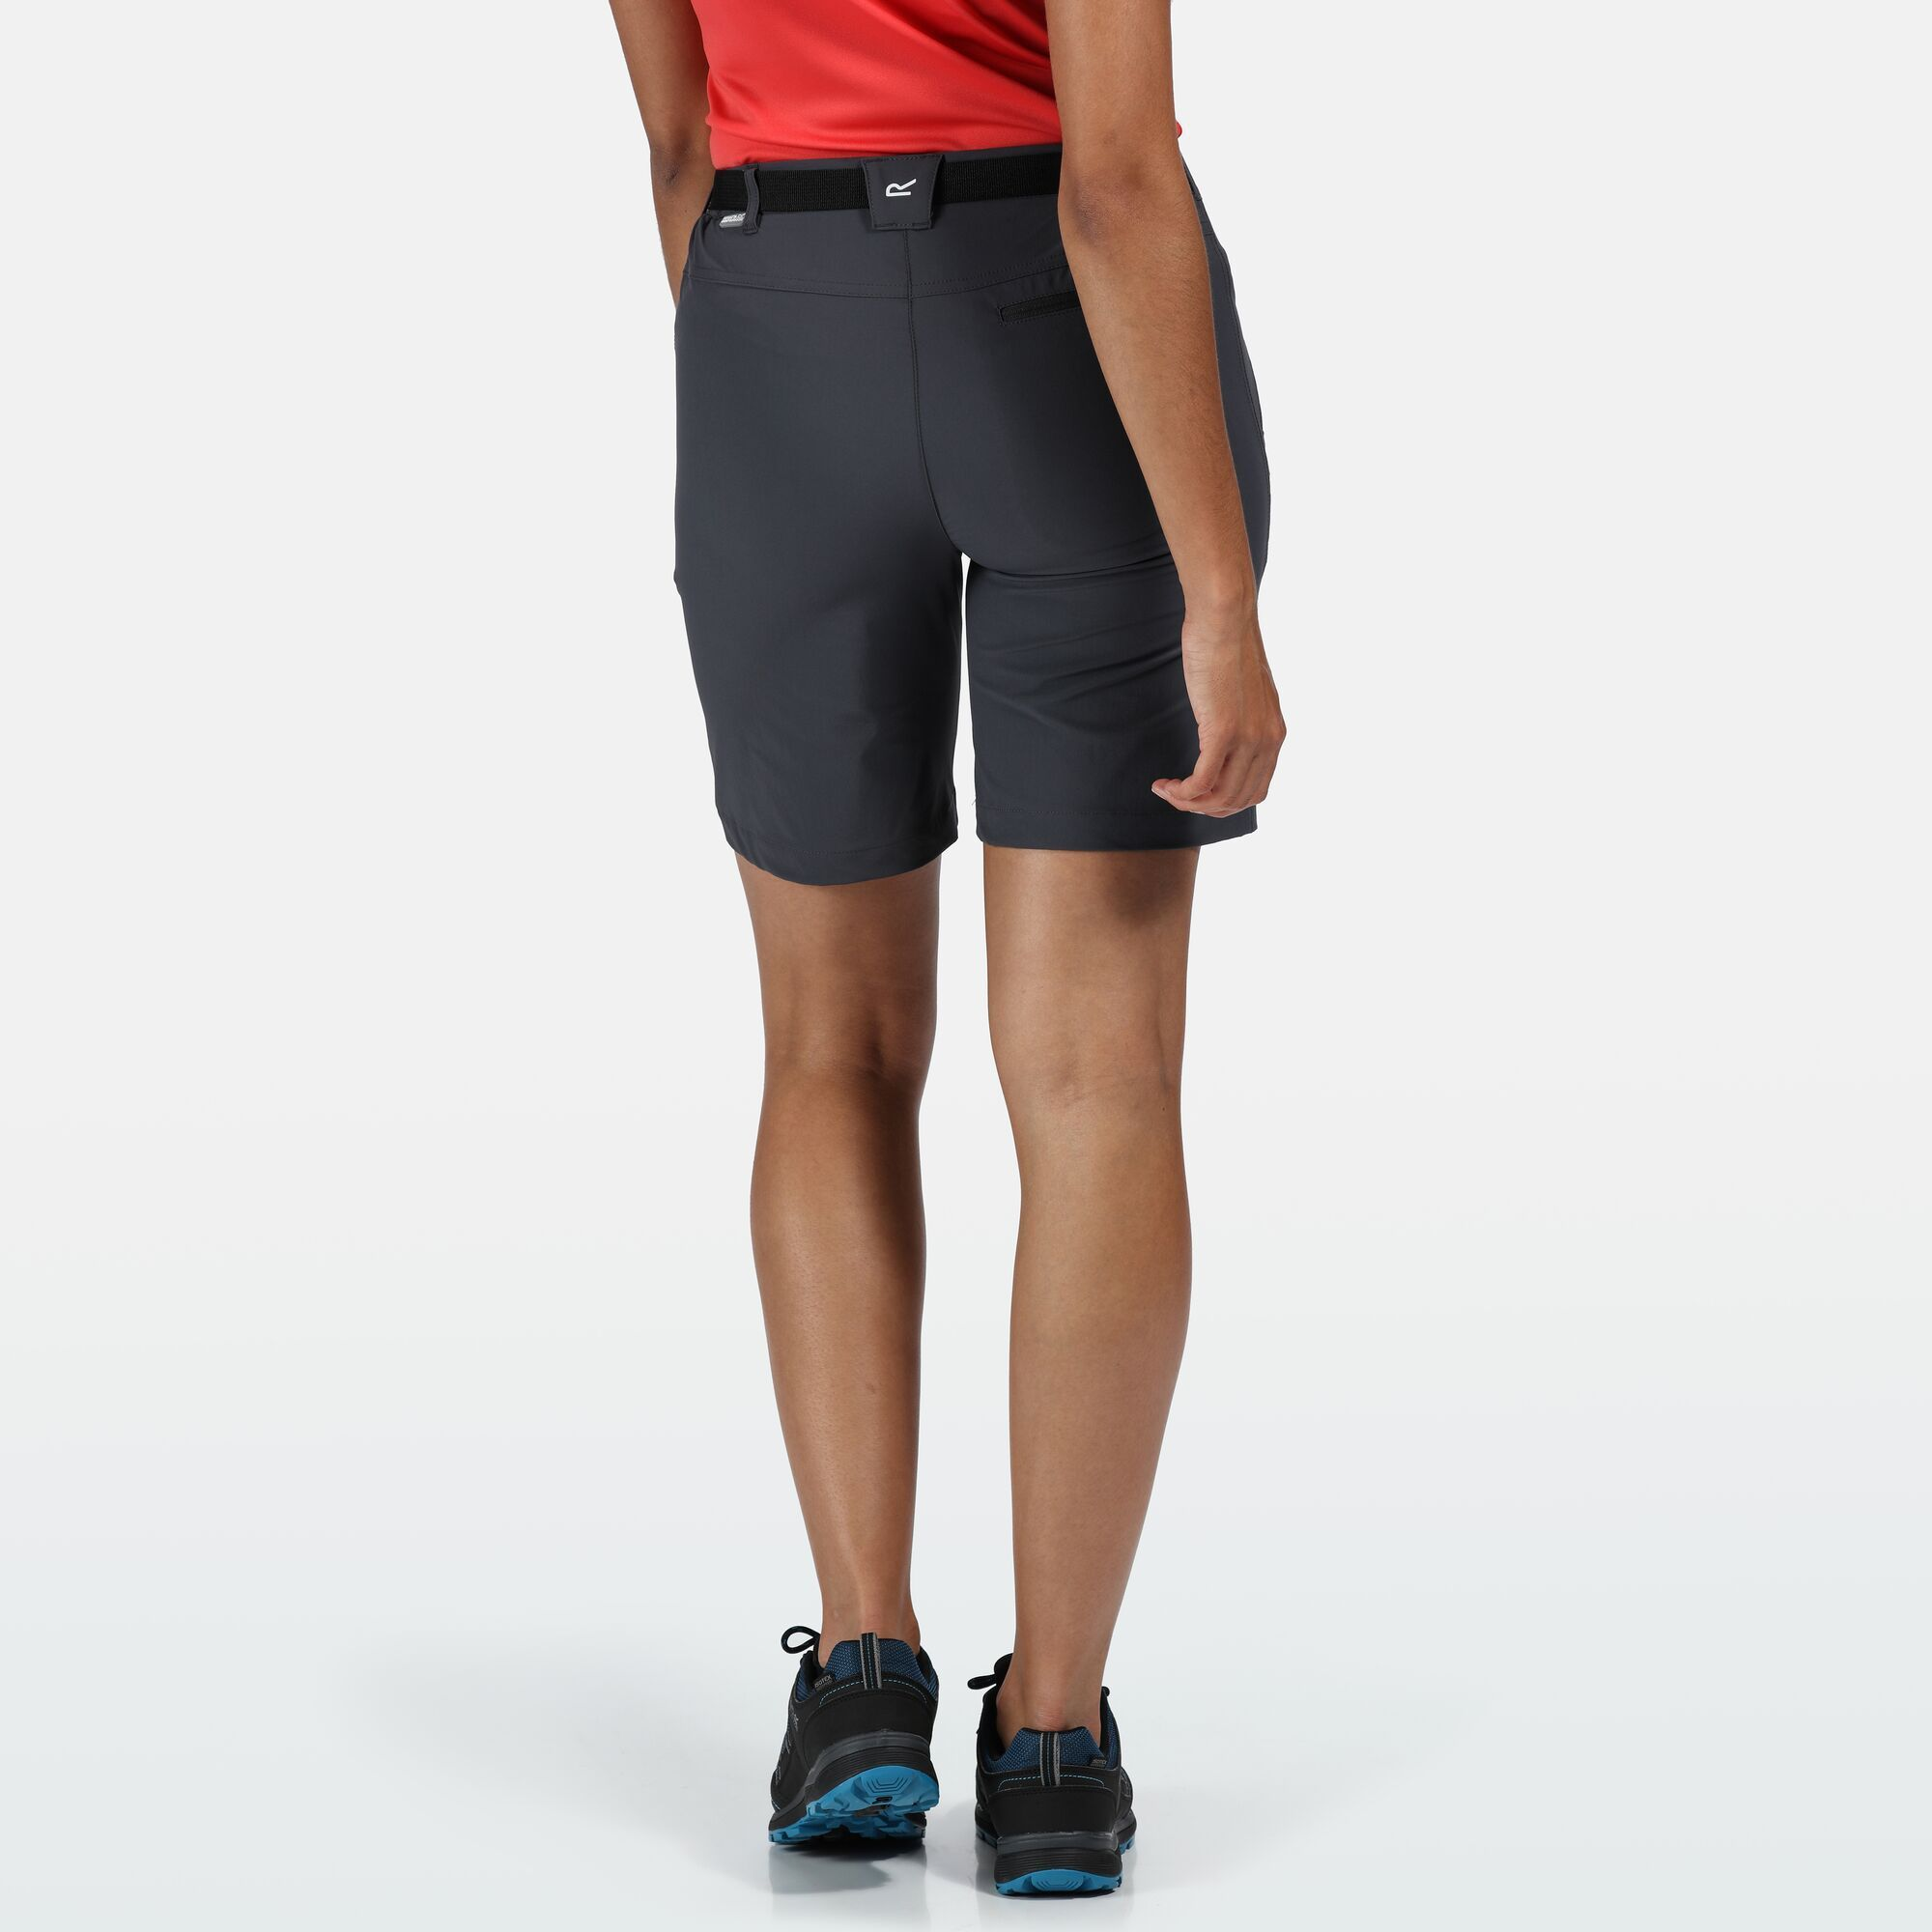 Regatta Womens/Ladies Xert III Stretch Shorts